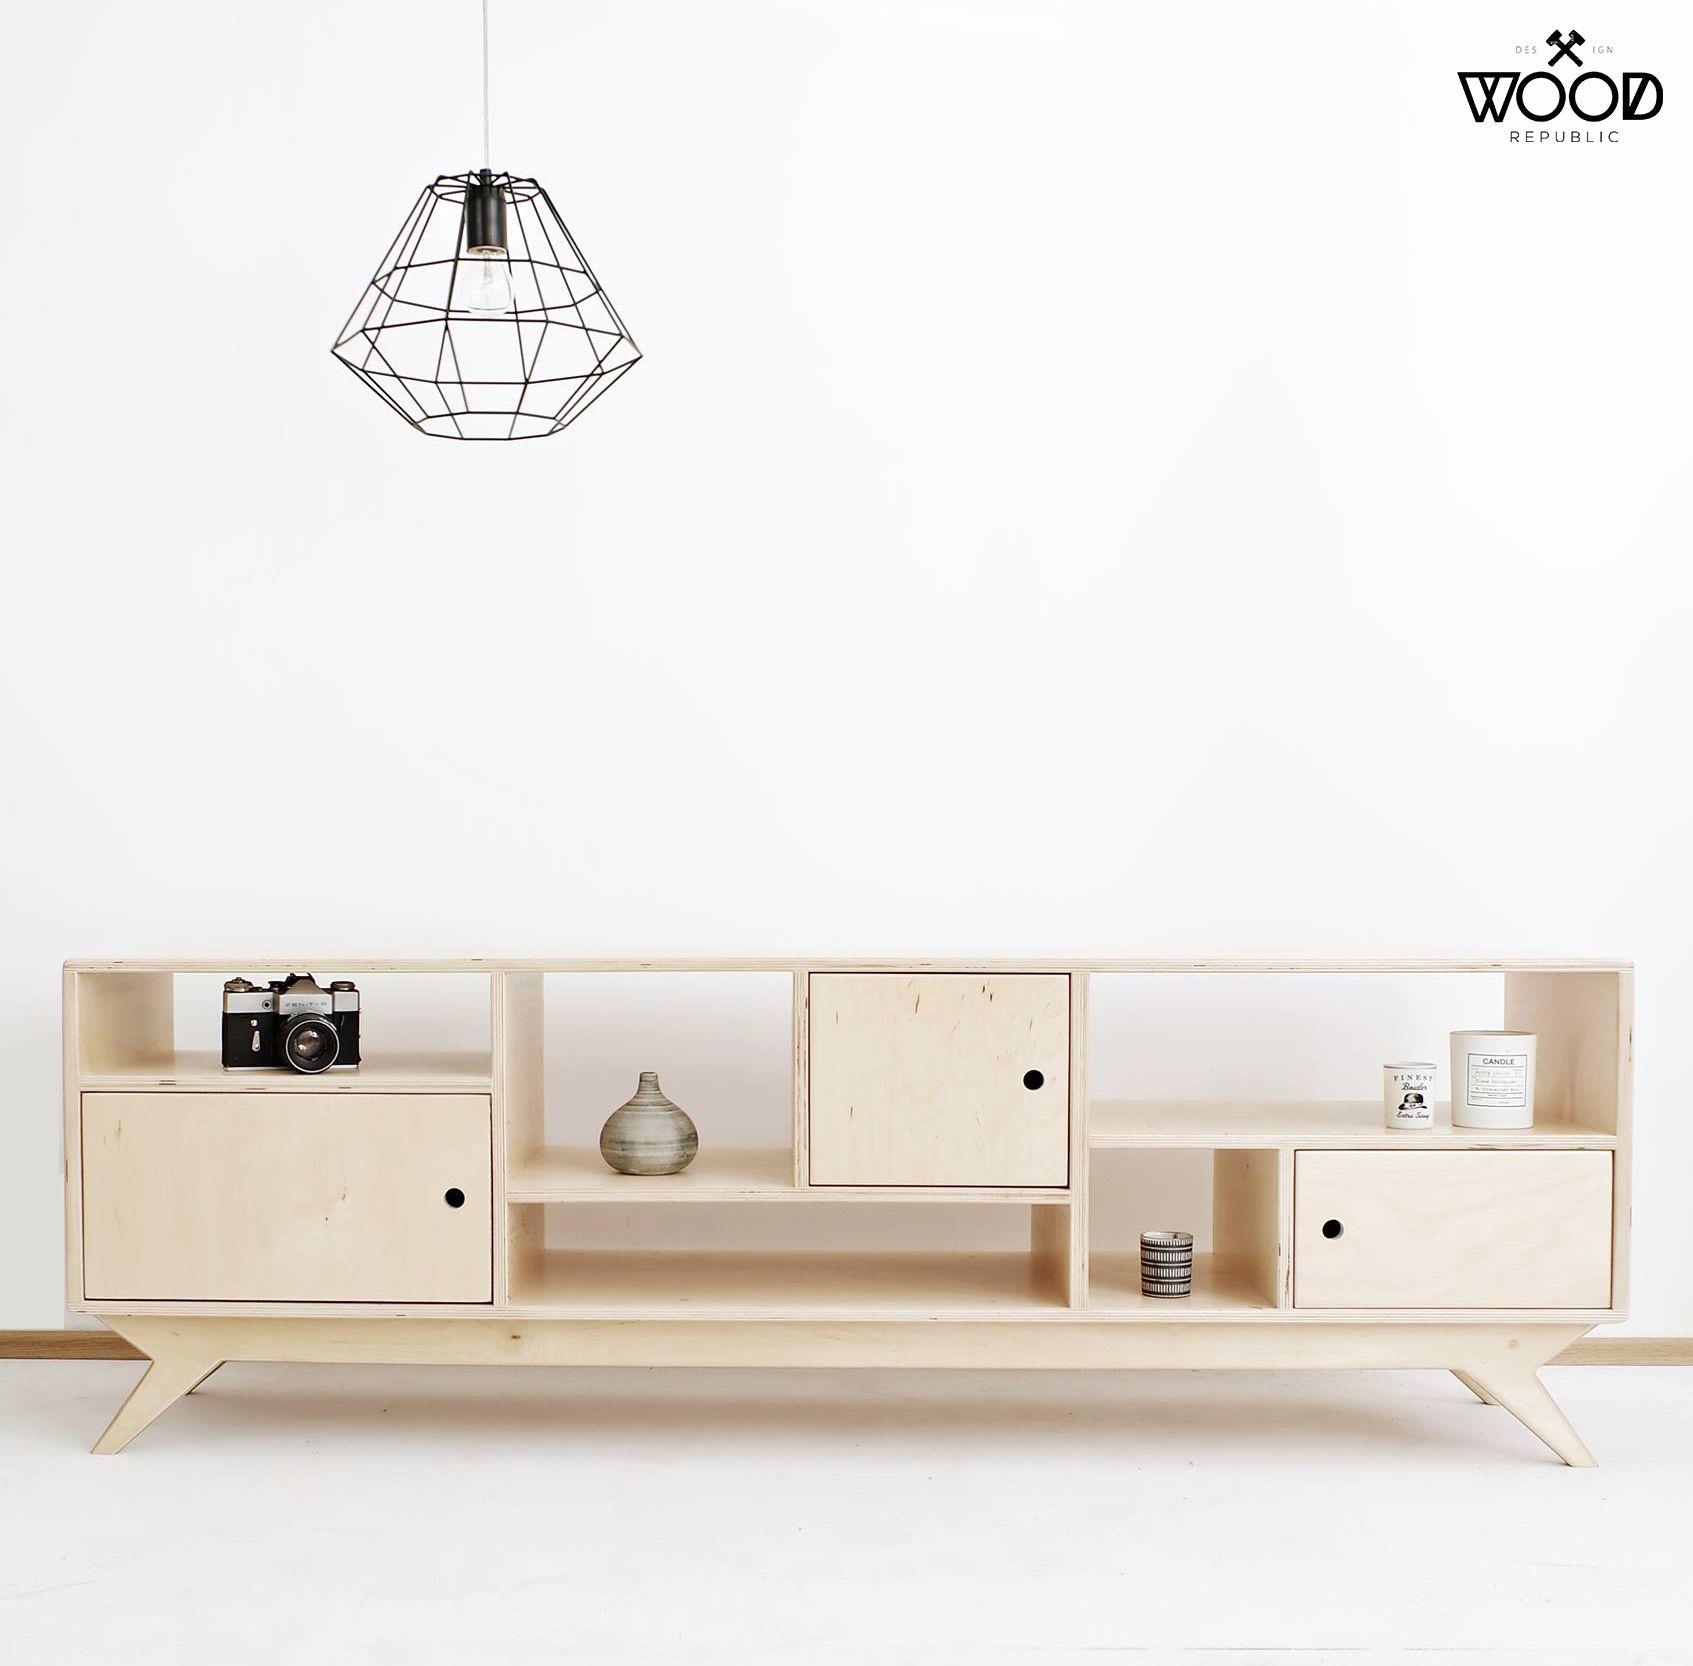 DRUPAL.2. Our Scandinavian, Plywood Tv Cabinet / Bureau